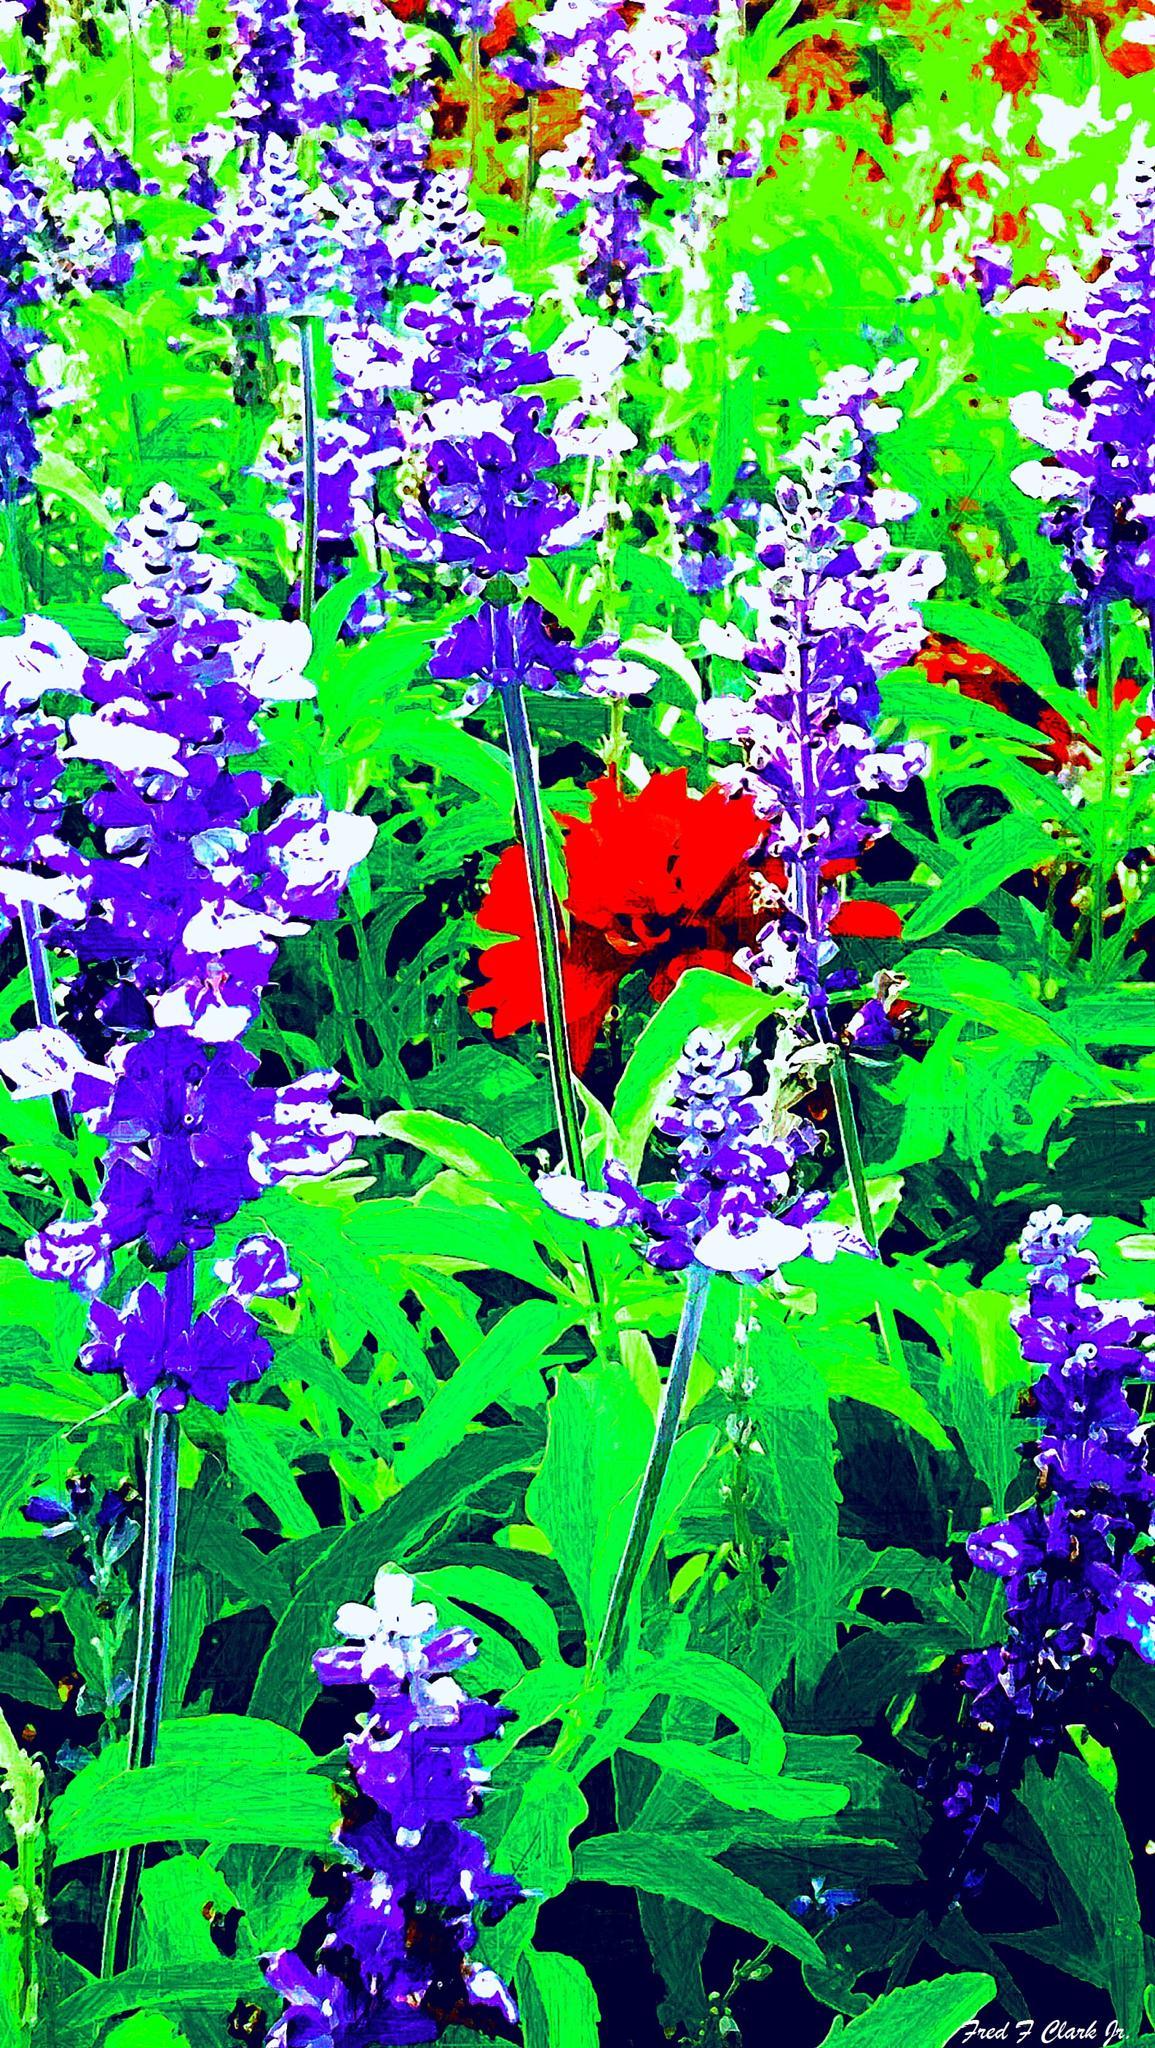 Red Flower In Purple by fred.clark.359